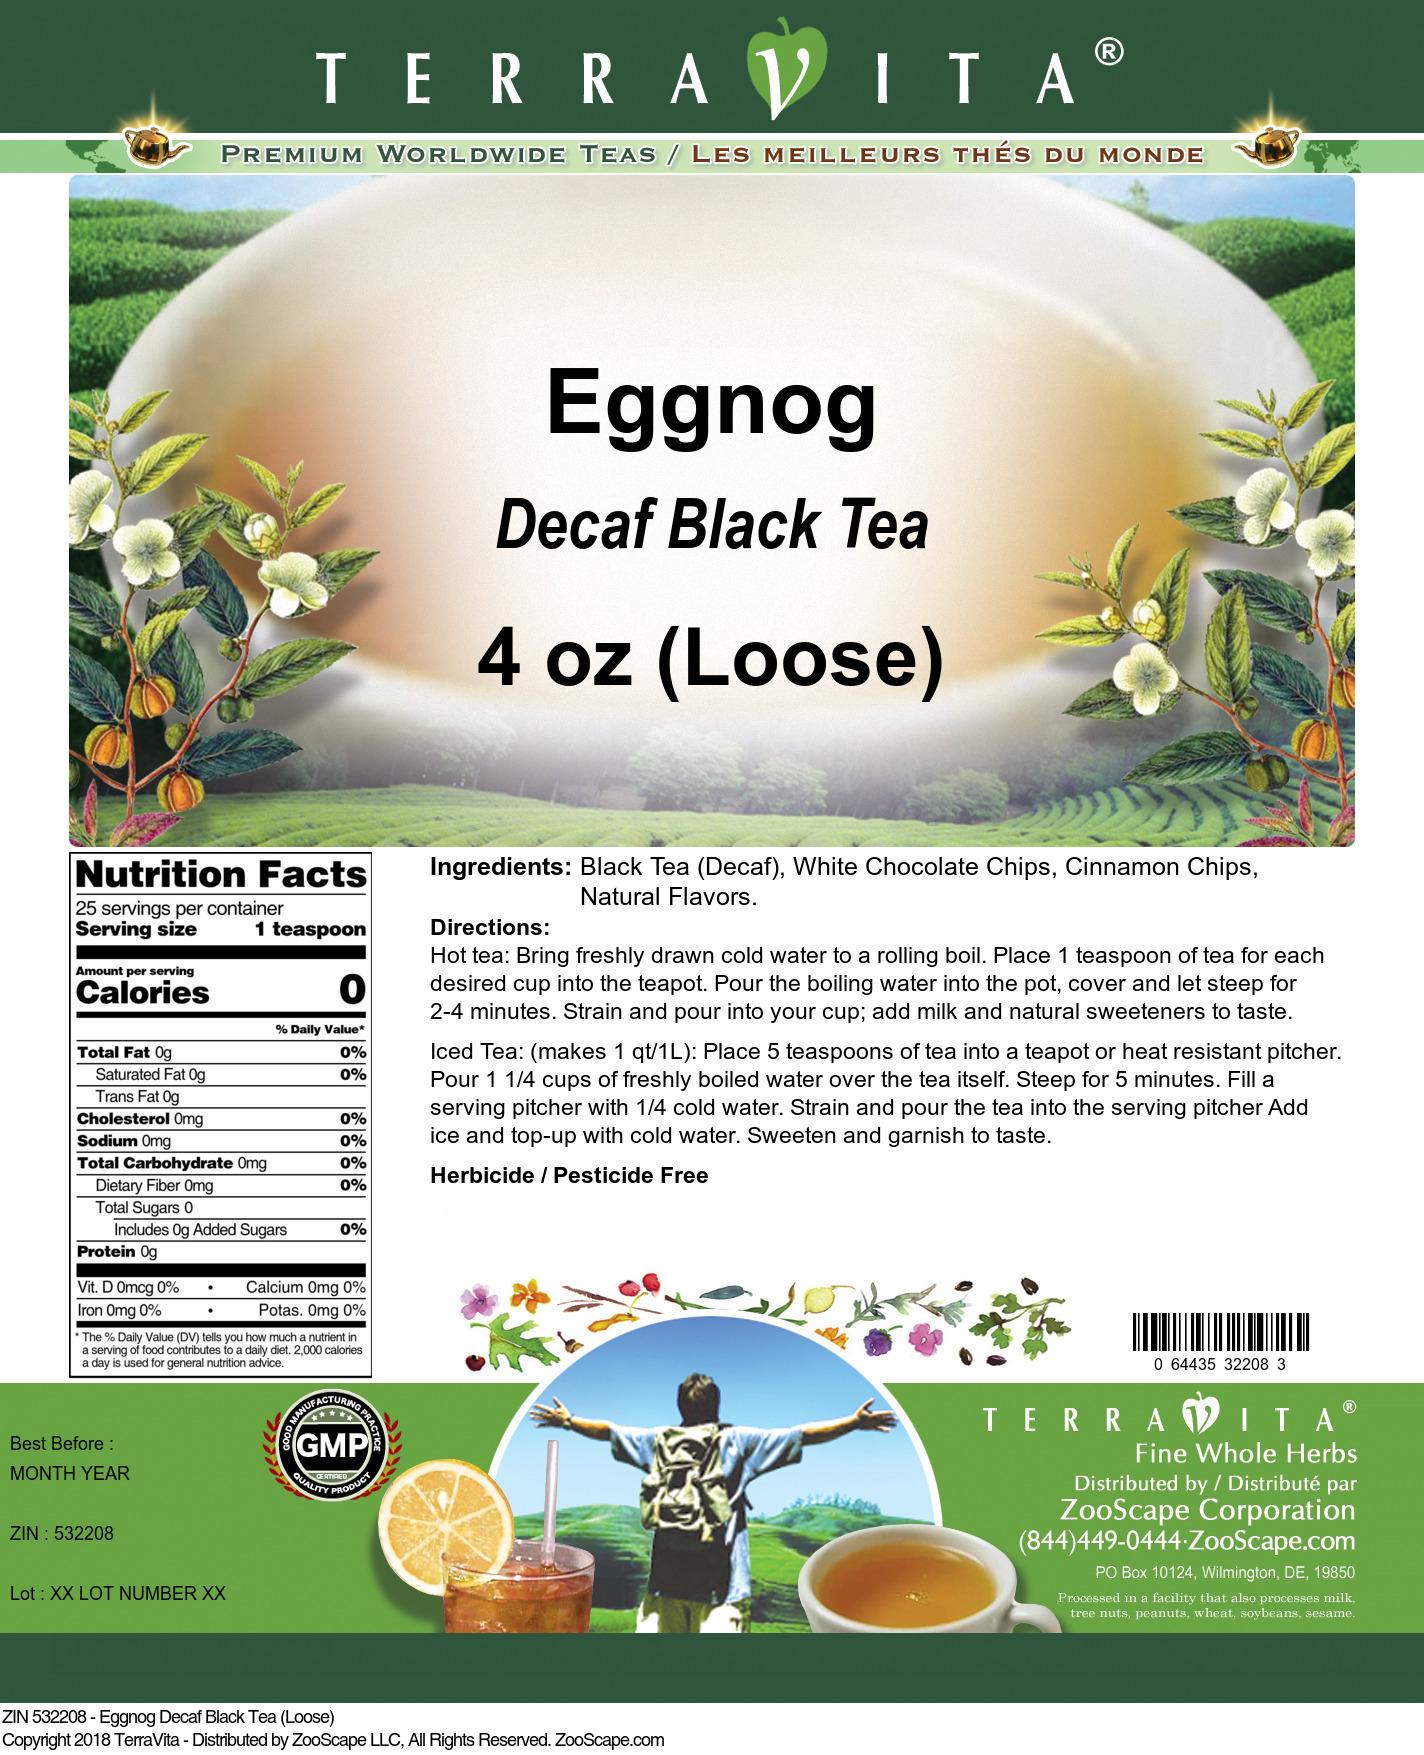 Eggnog Decaf Black Tea (Loose)